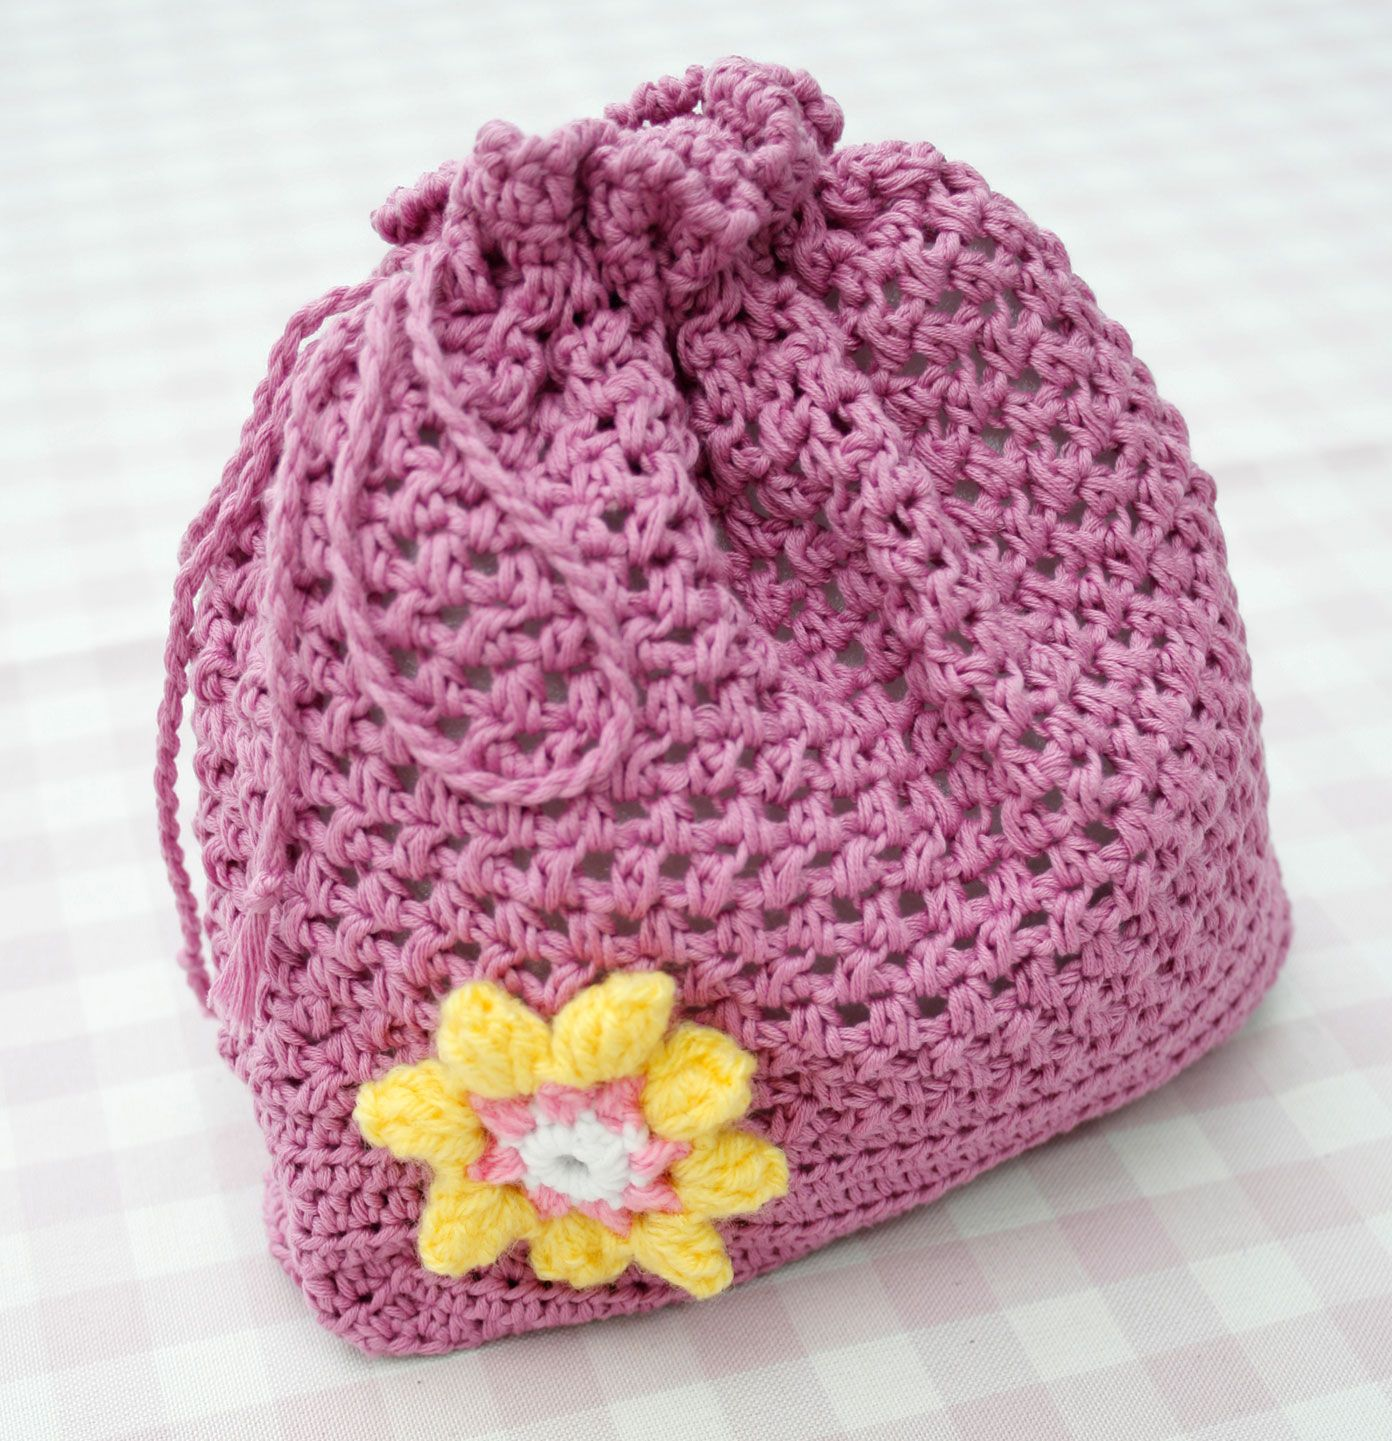 crochet purse patterns for children | Free crochet pattern: Crochet ...